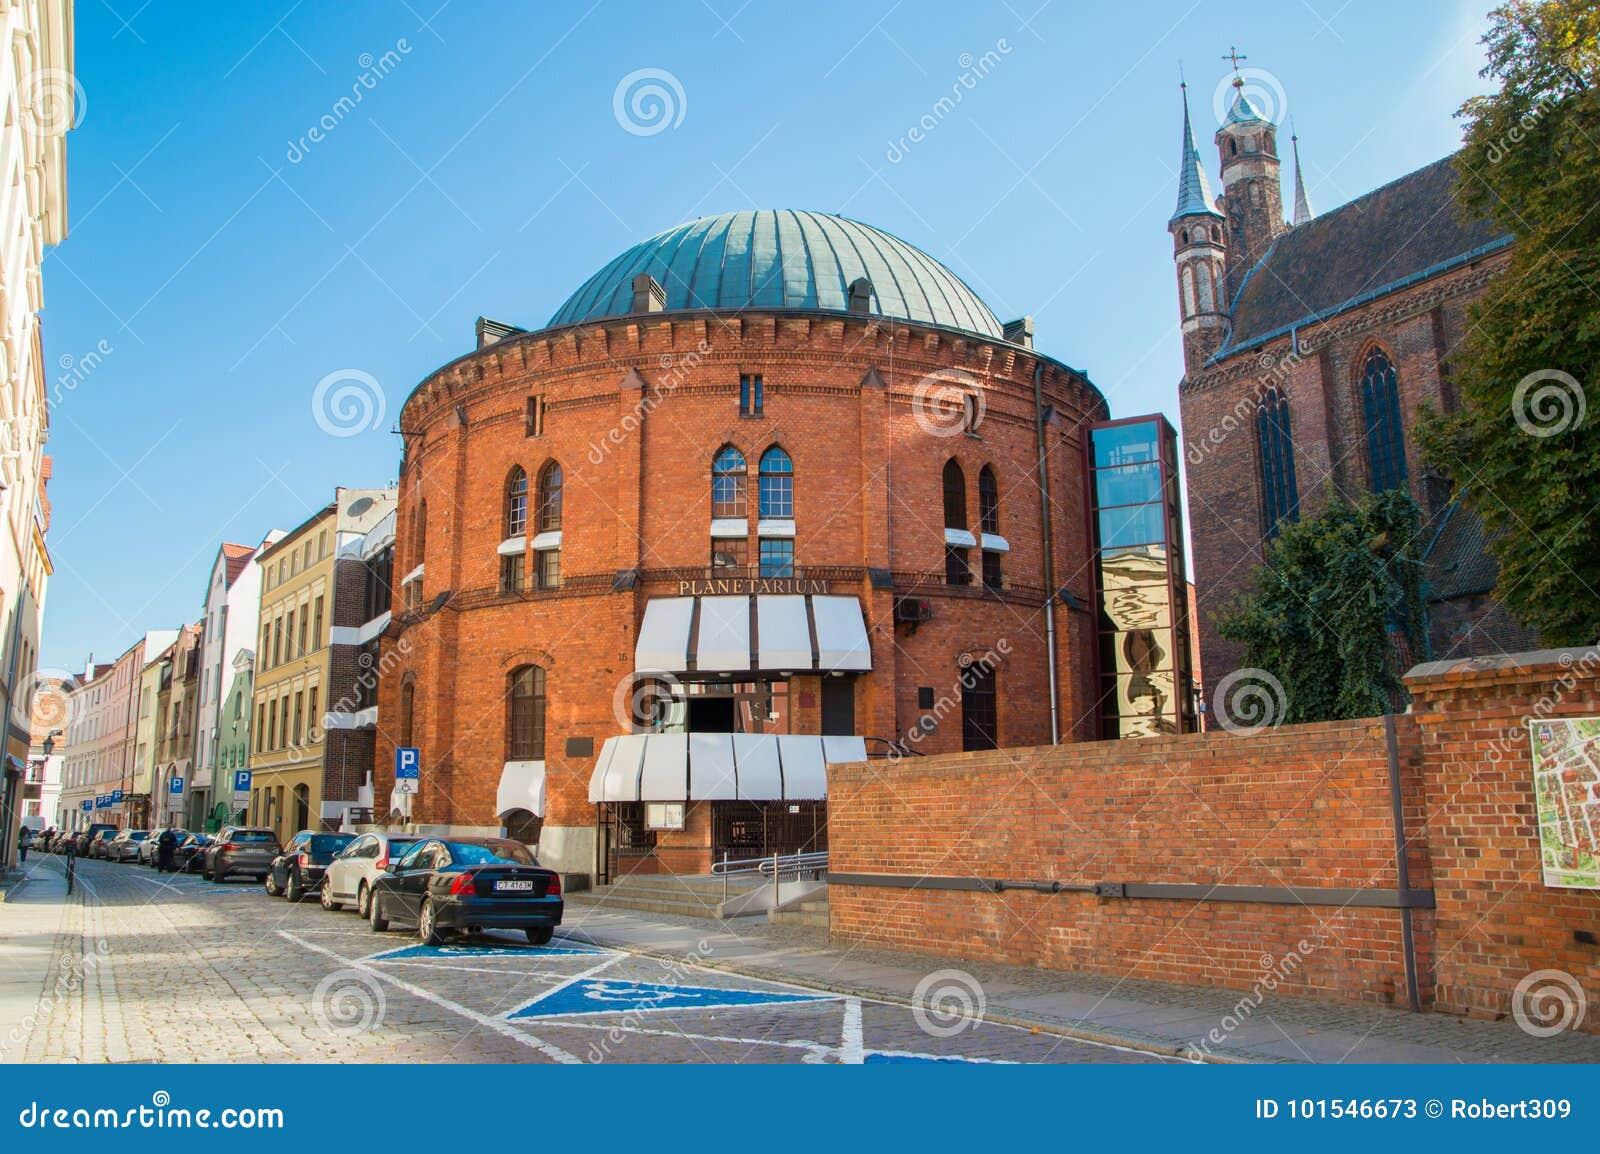 Buiding de Wladyslaw Dziewulski Planetarium na cidade velha de Torun